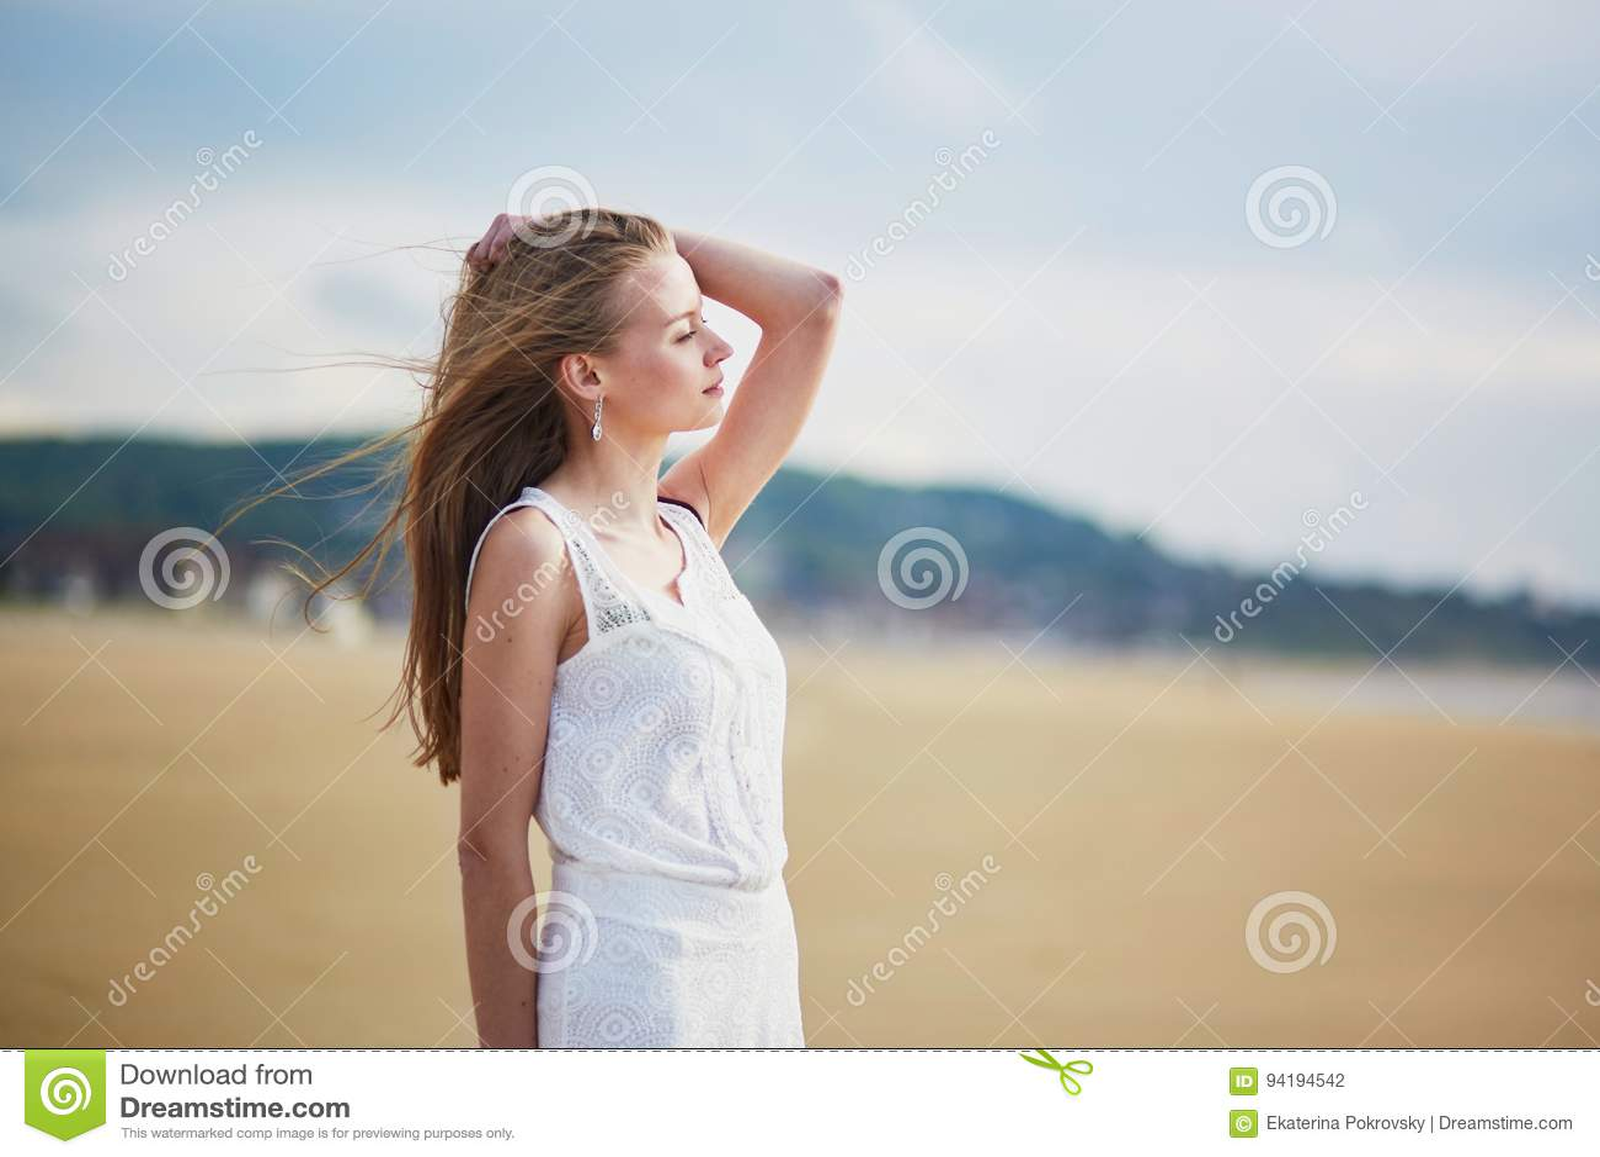 Beautiful Curvy Young Woman Enjoying Ocean At The Beach